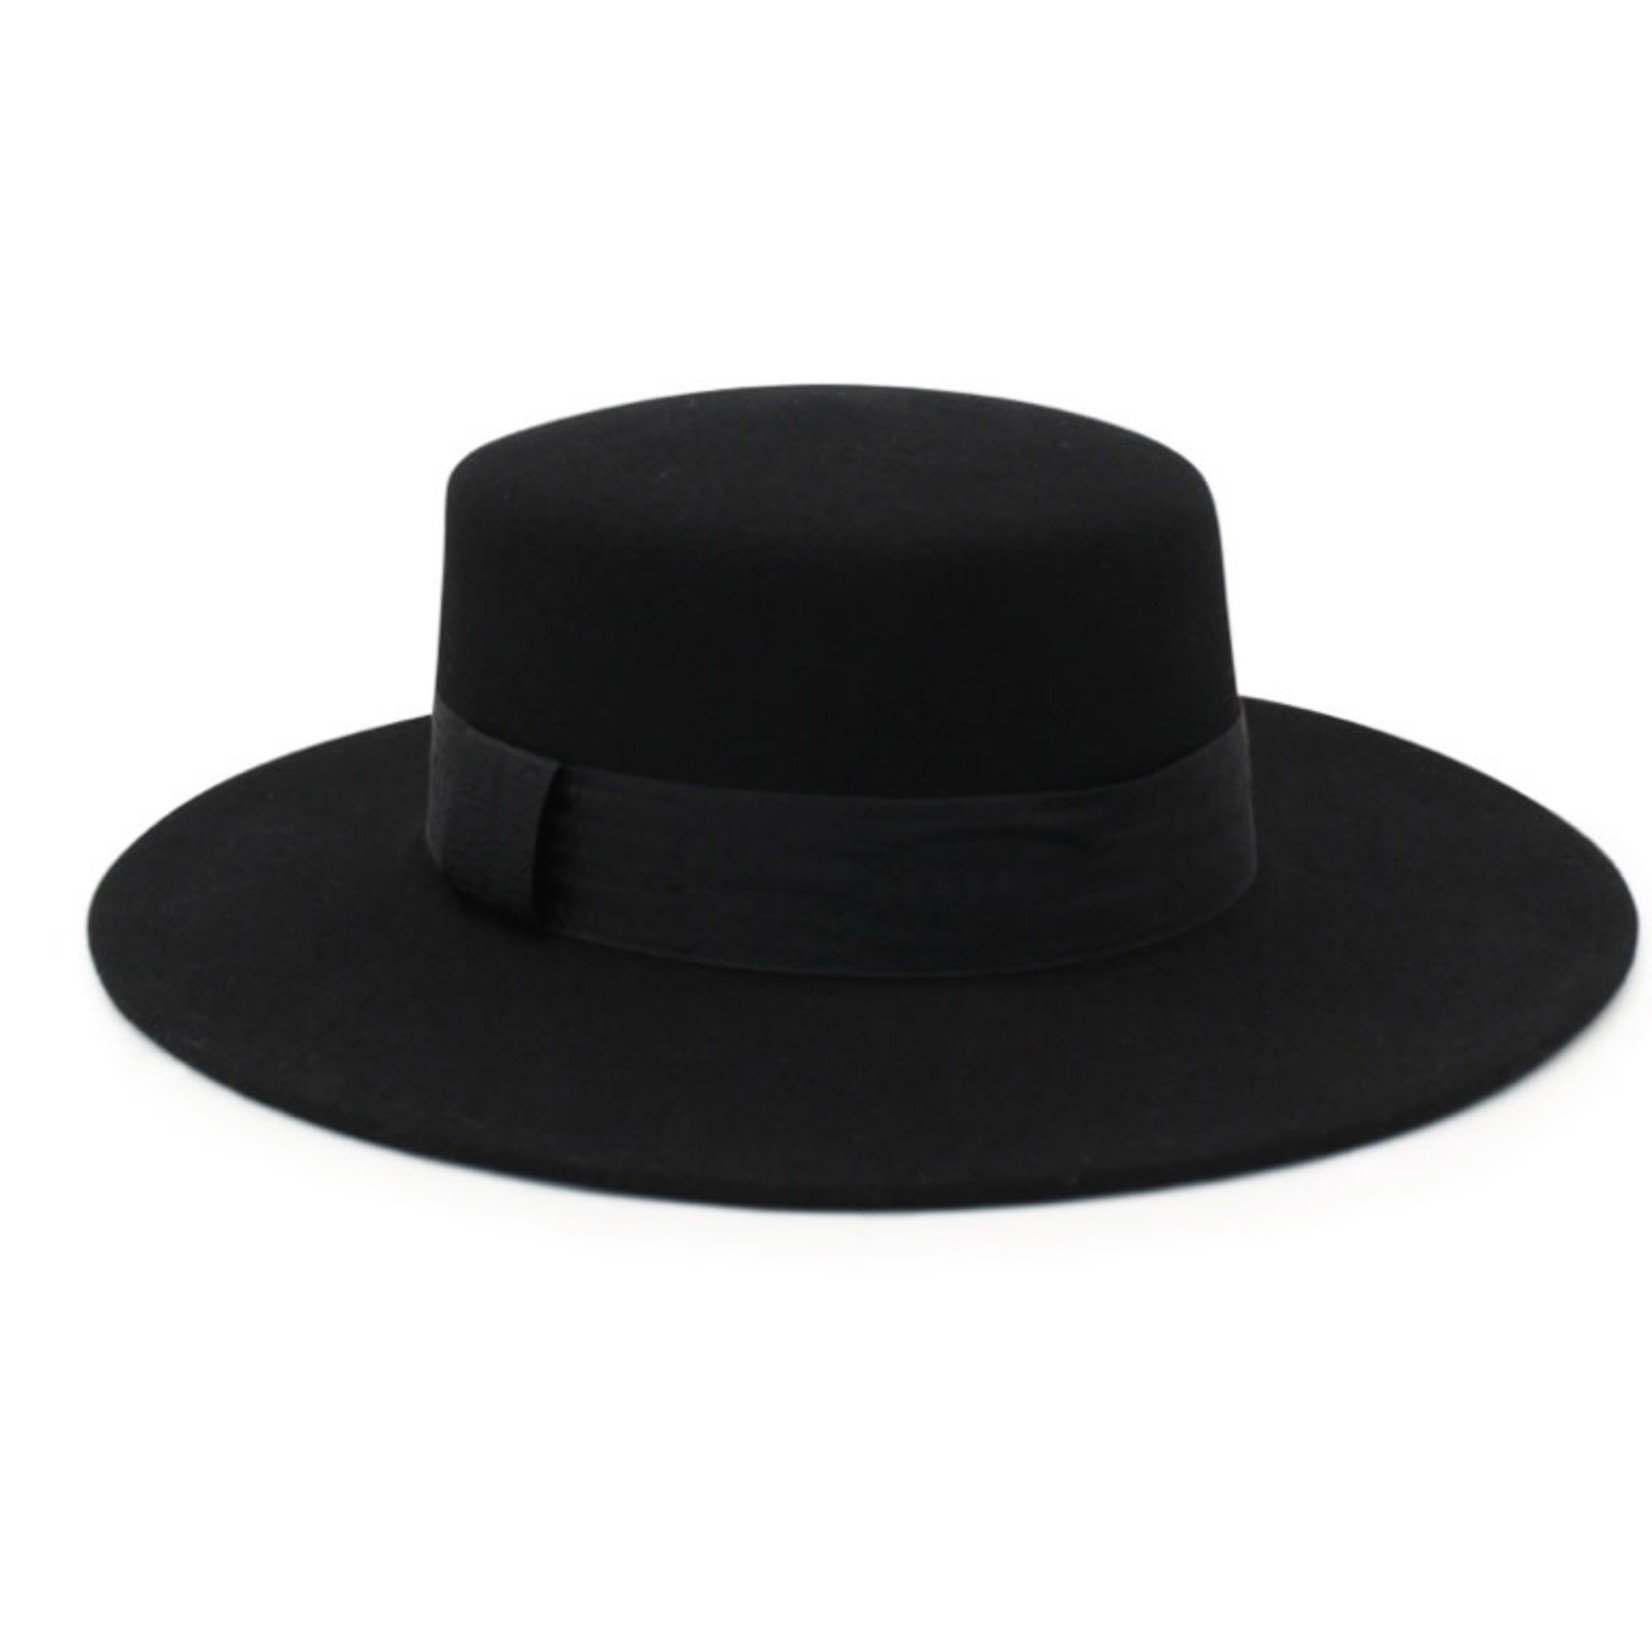 Ace Of Something Gunsmoke Boater Hat